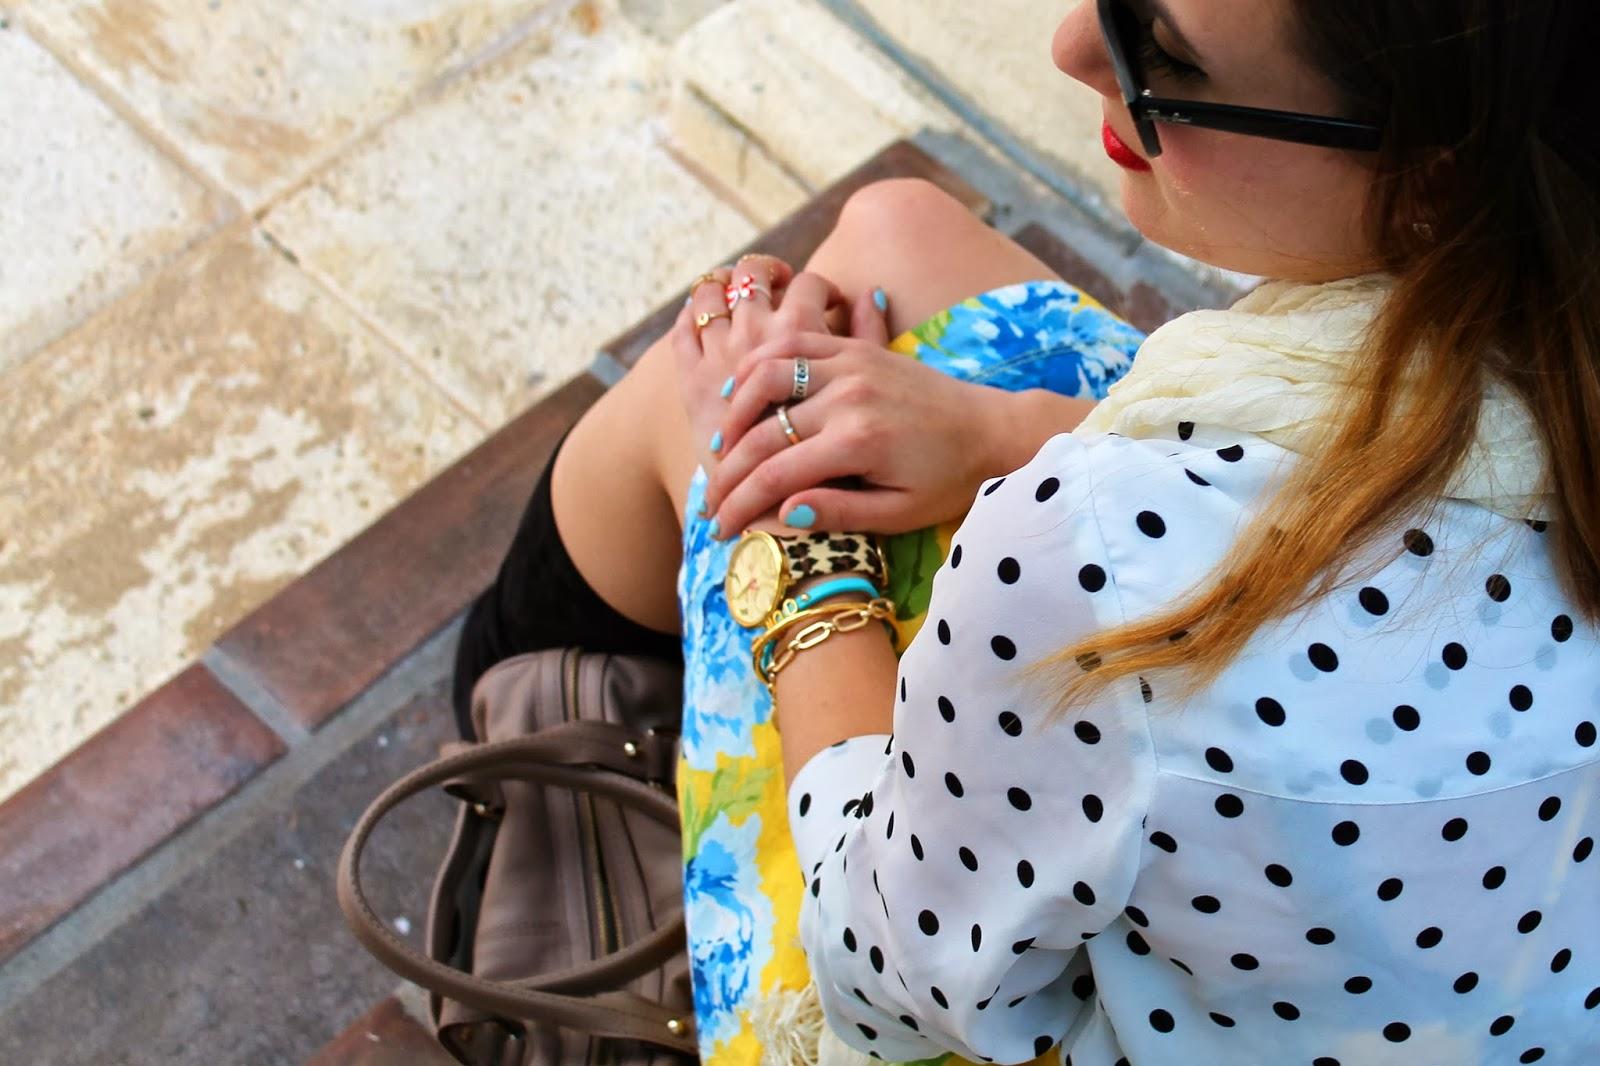 Kate Spade, prep, floral, polka dot, palm beach, fashion blog, Abercrombie&Fitch, Nordstrom, BCBGeneration, floral,